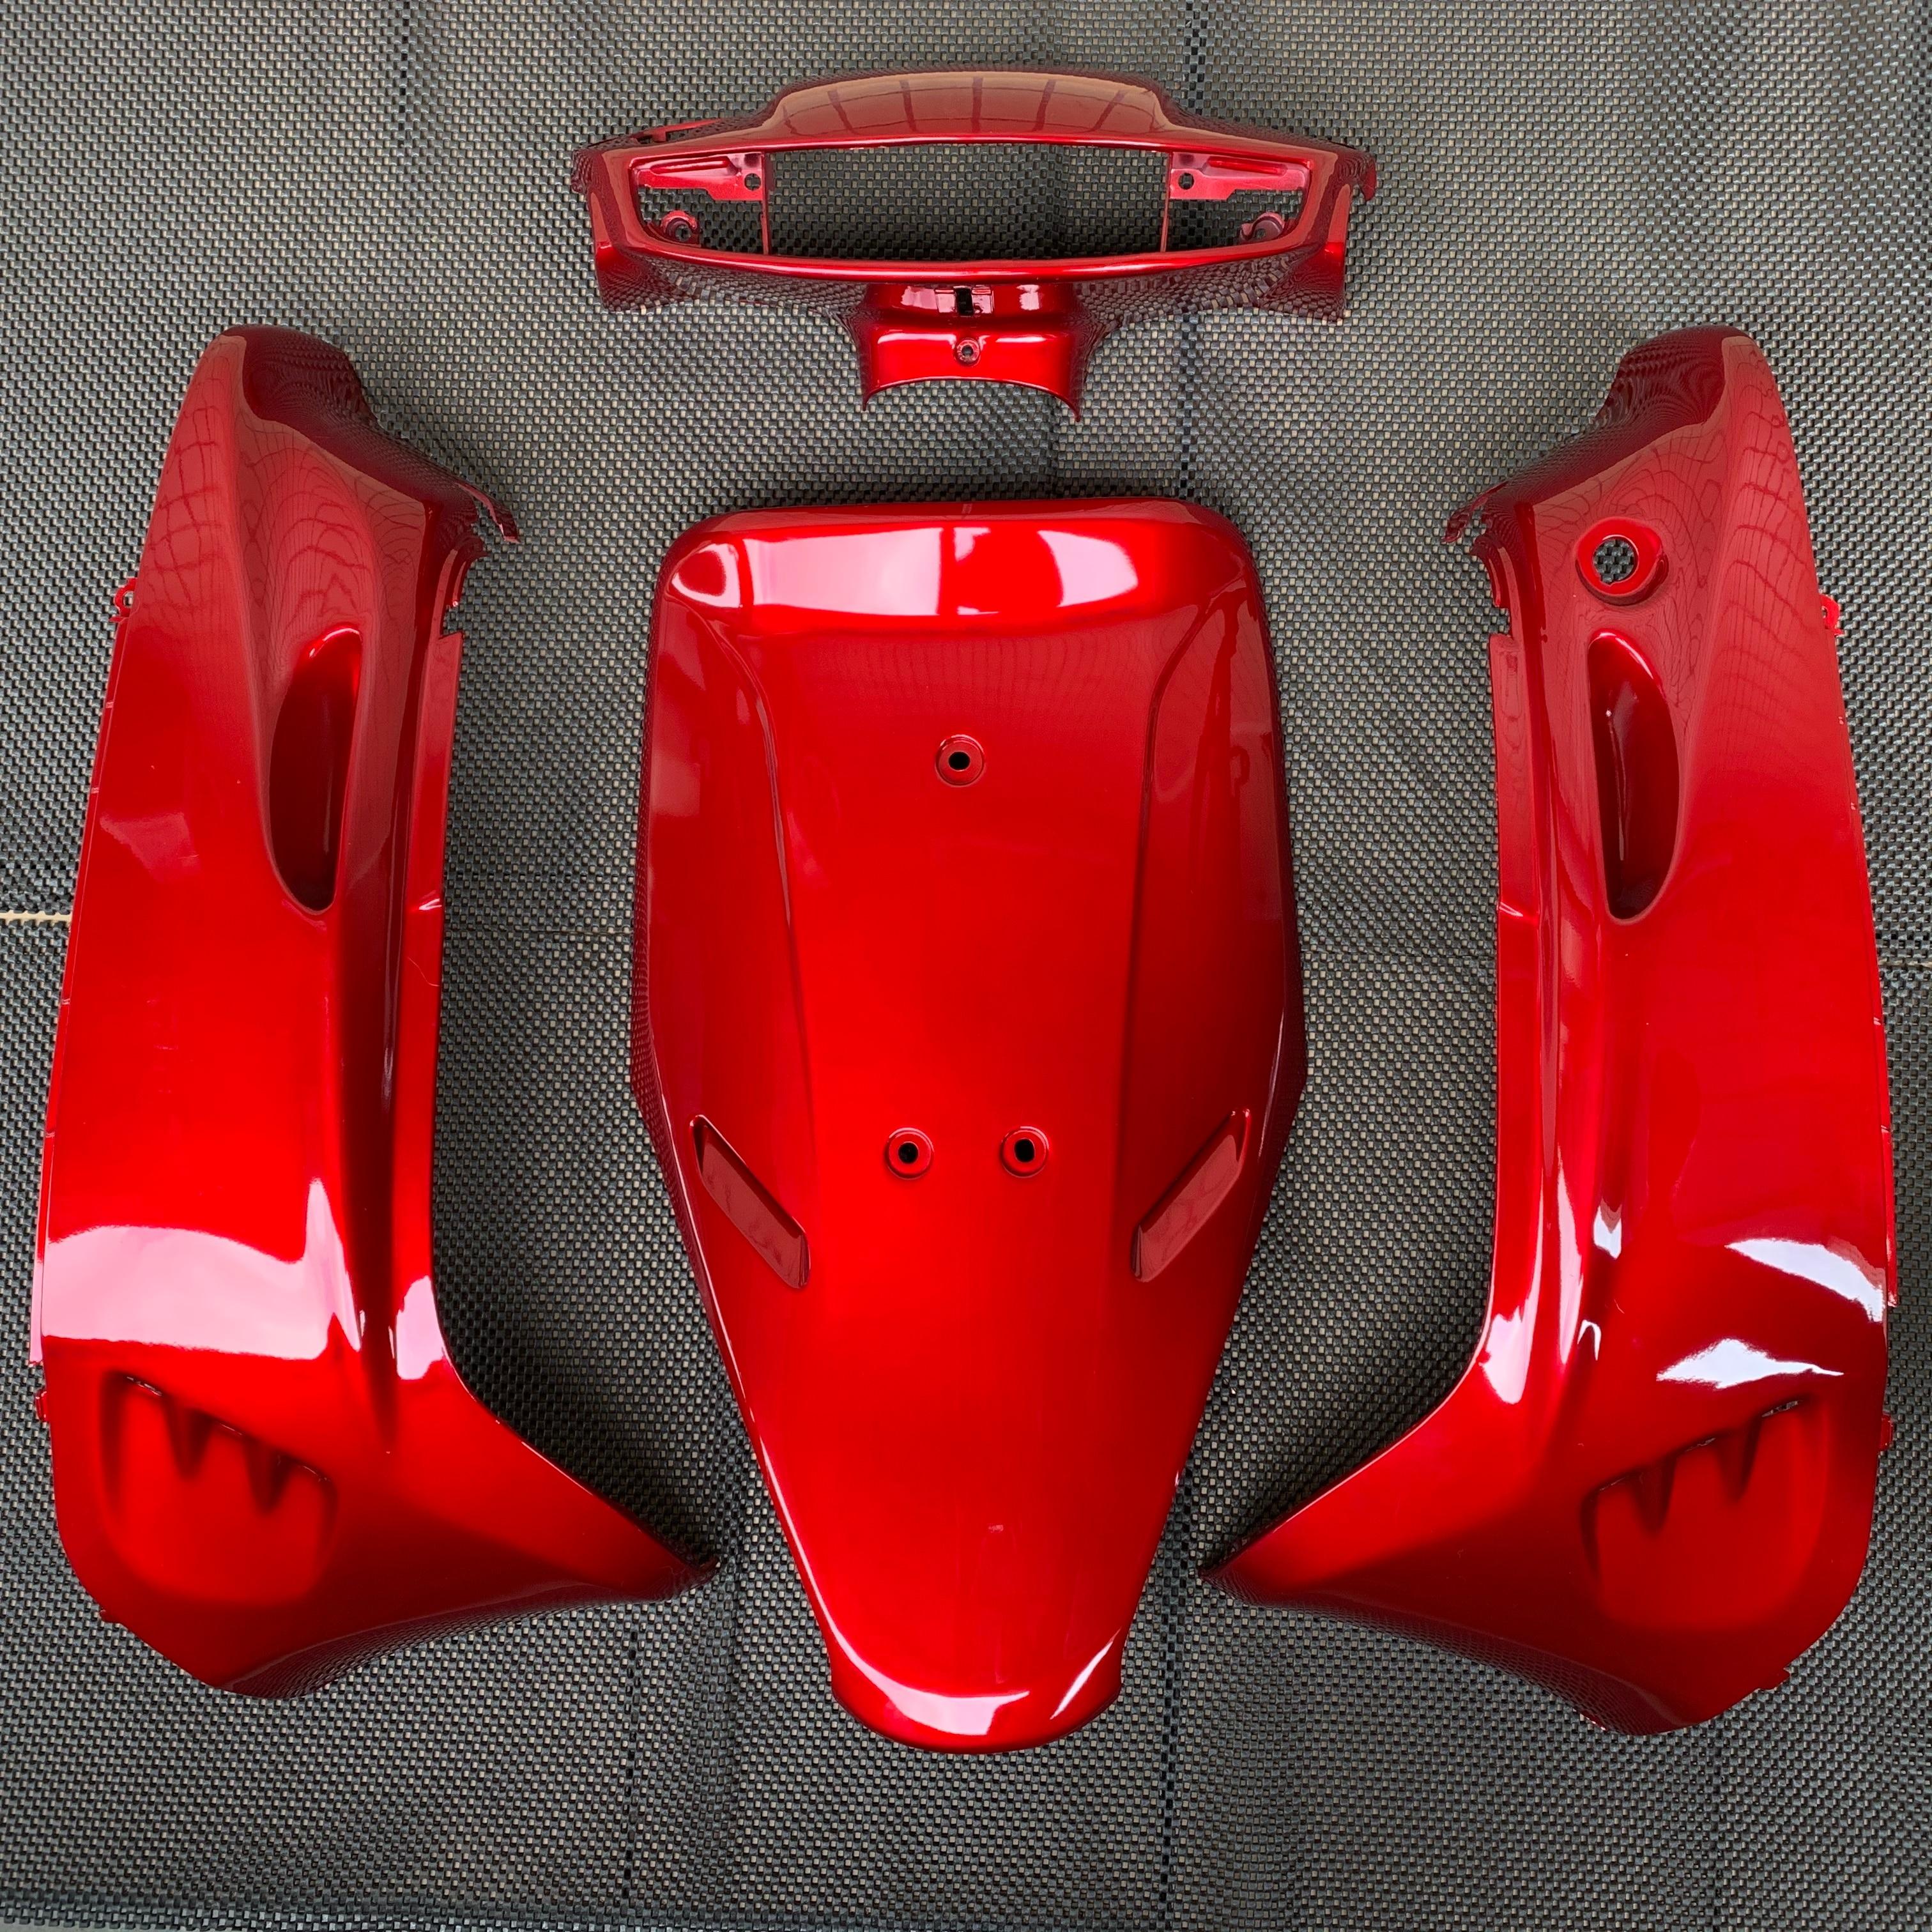 Body Kit For DIO50 AF17 AF18 AF25 Outer Panel Scooter Shell Tail Light ABS Plastic Dio 50